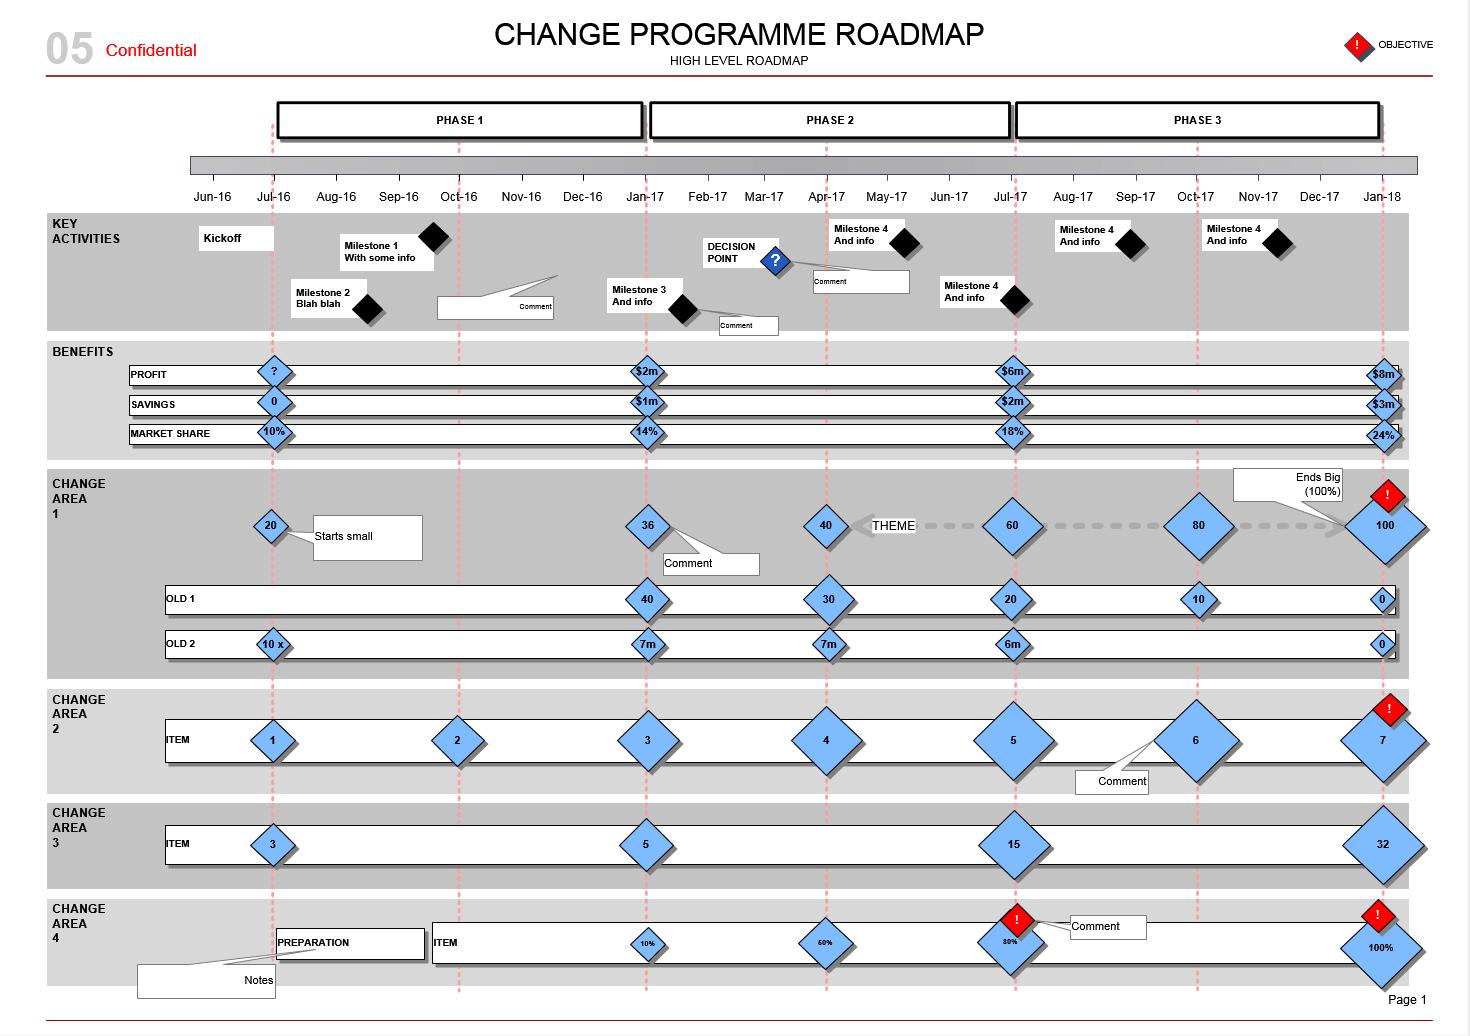 Change Programme Roadmap Transitions Kpis Amp Benefits